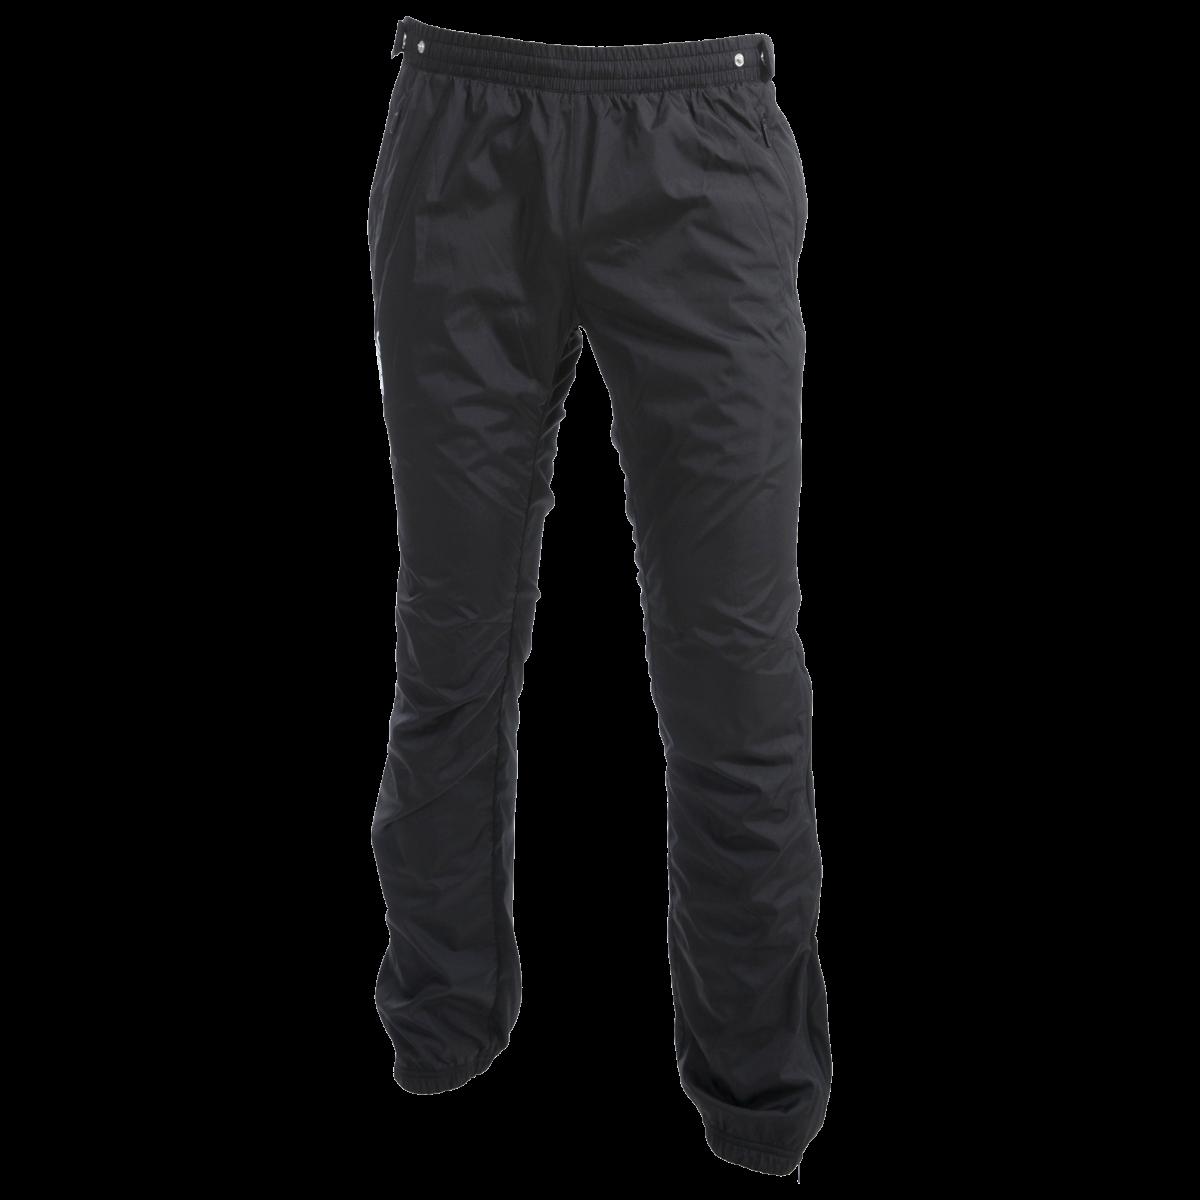 Swix UniversalX Men's Pants